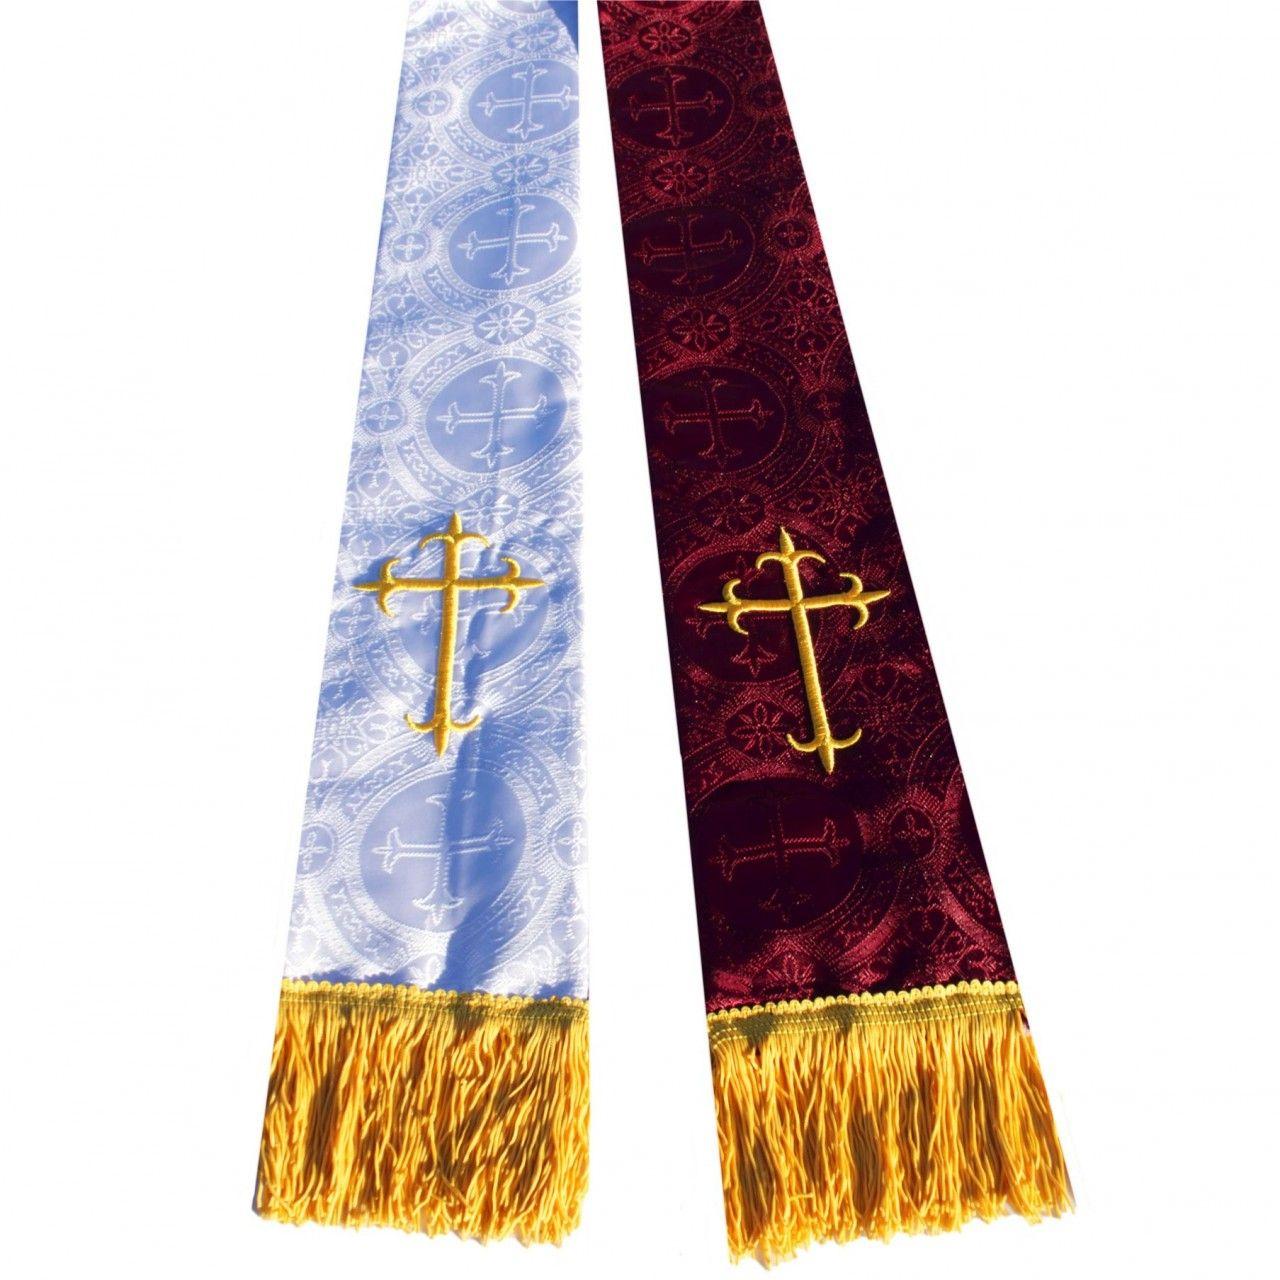 Premium Brocade Reversible Clergy Stole - Burgundy/White